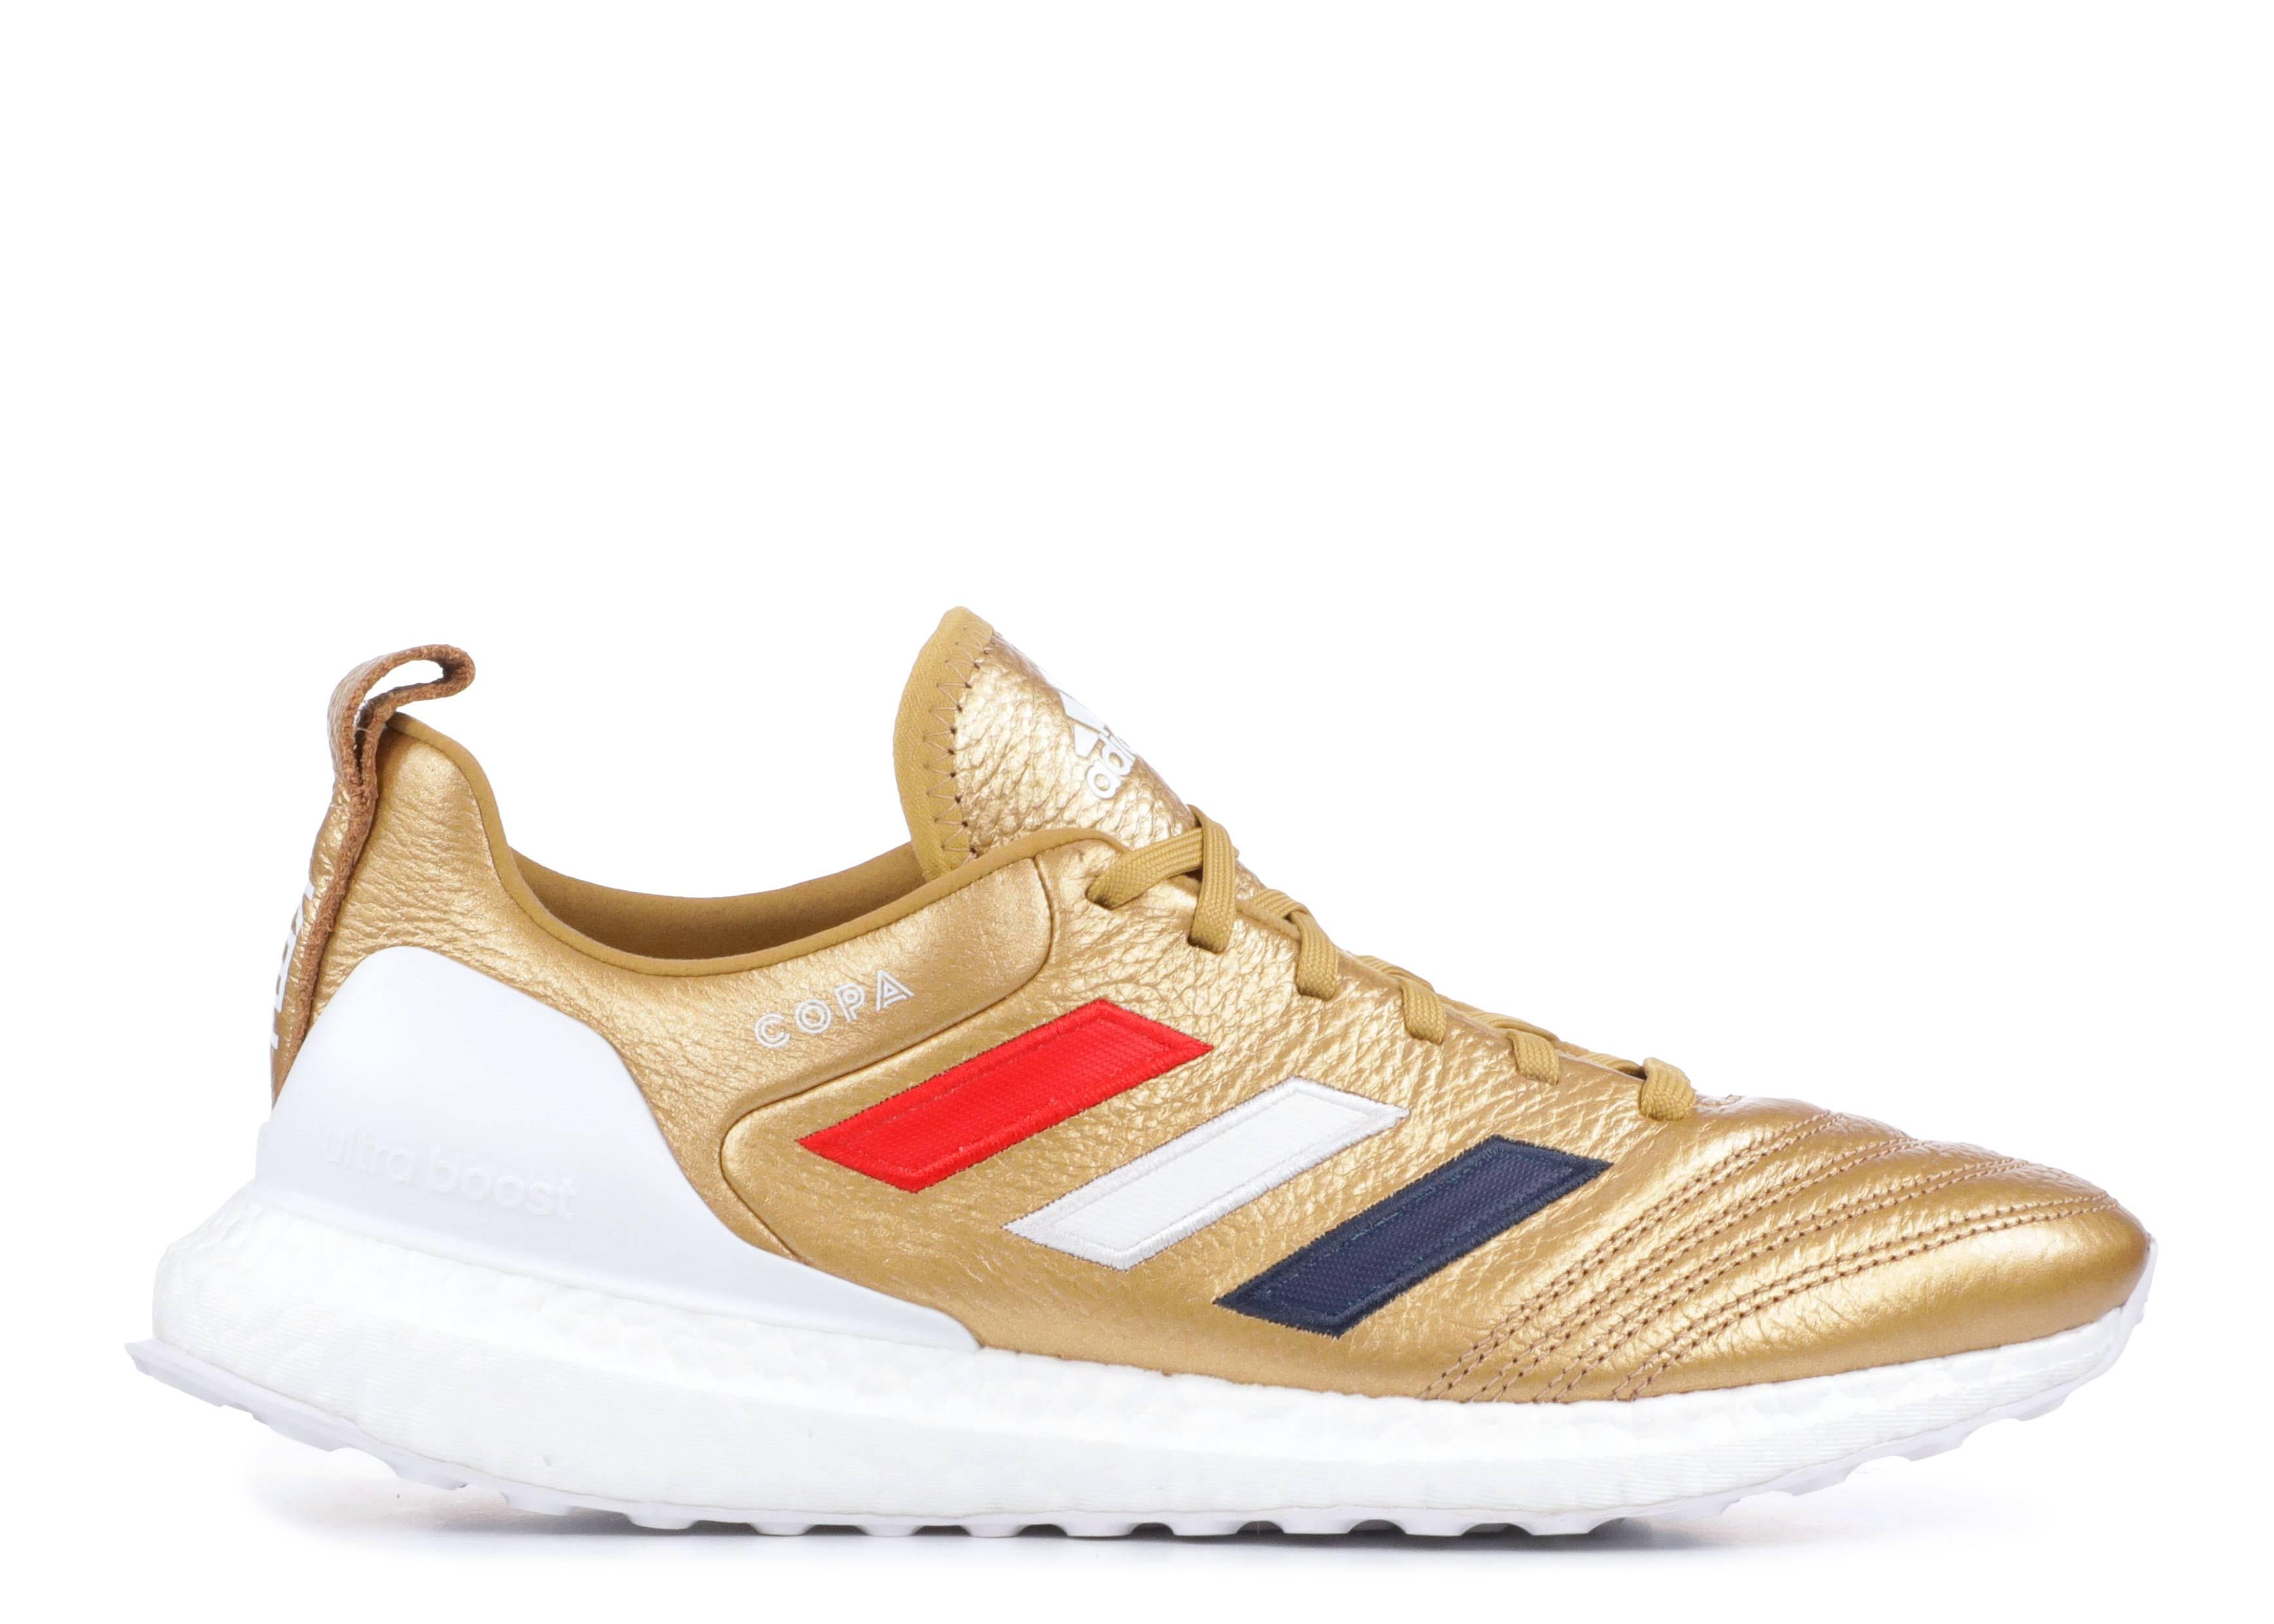 info for ffe52 3c3f0 adidas. COPA 18+ Ultraboost Kith